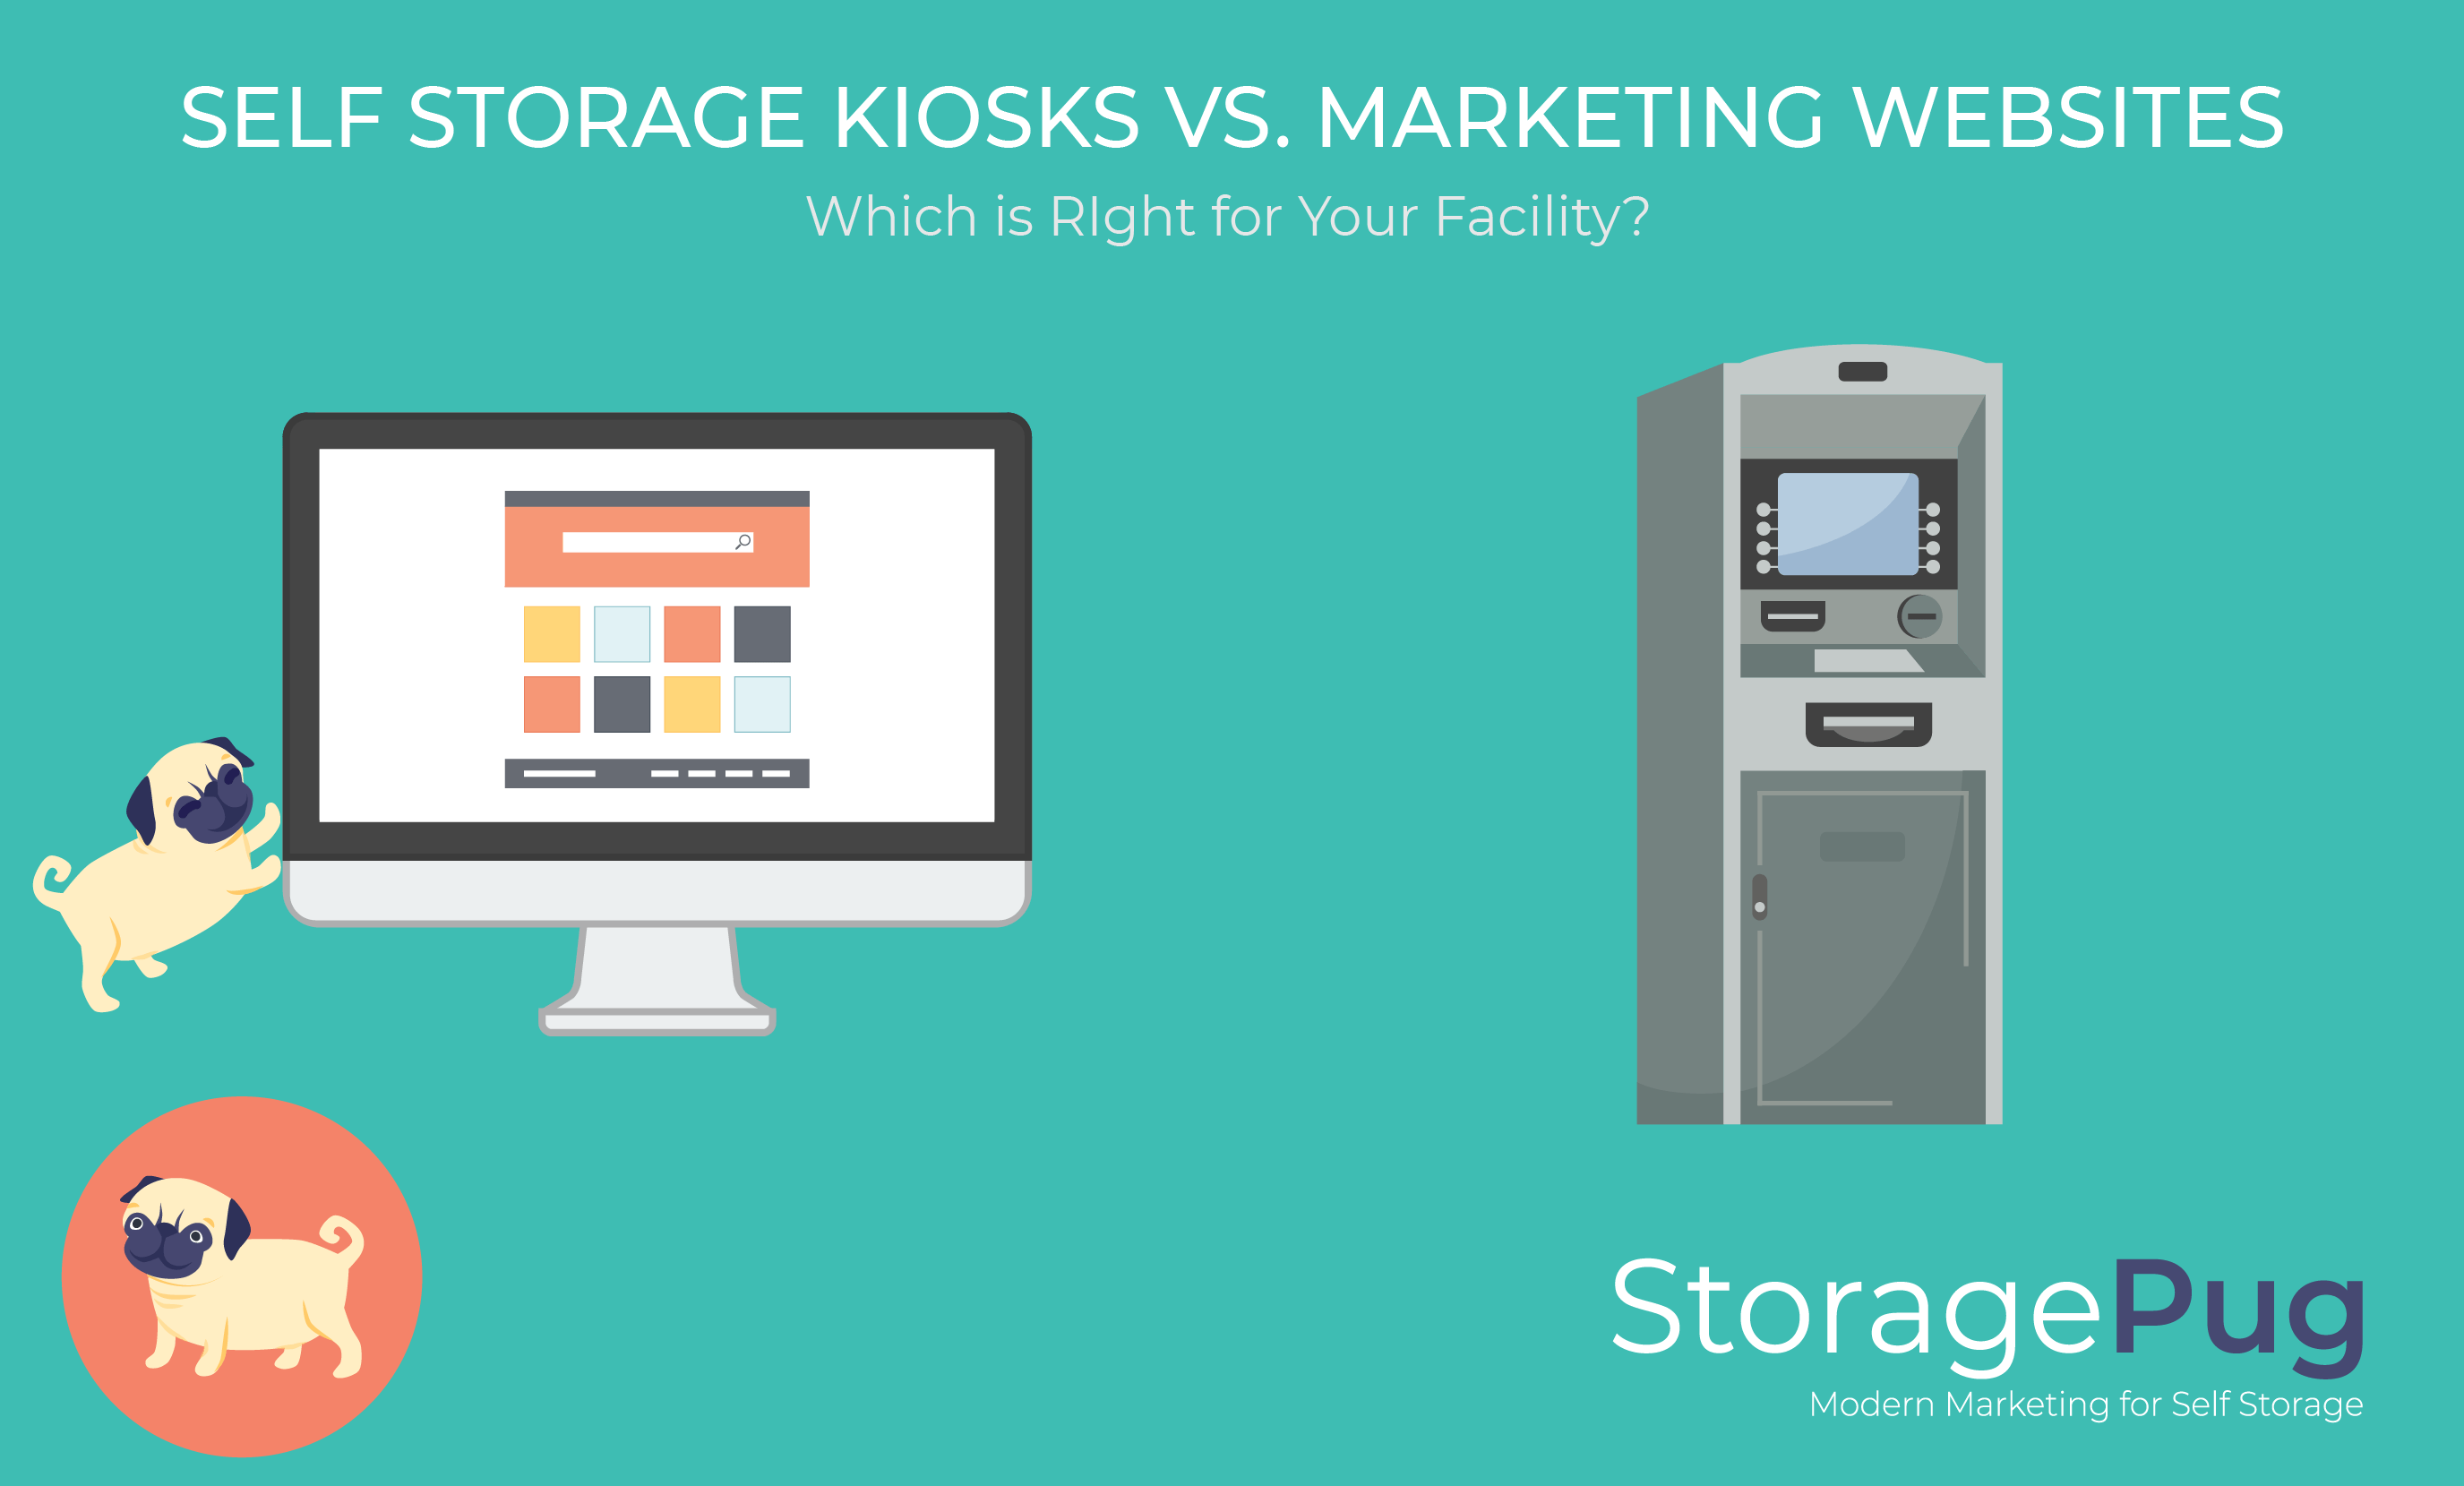 Self Storage Kiosk vs Marketing Website@5x